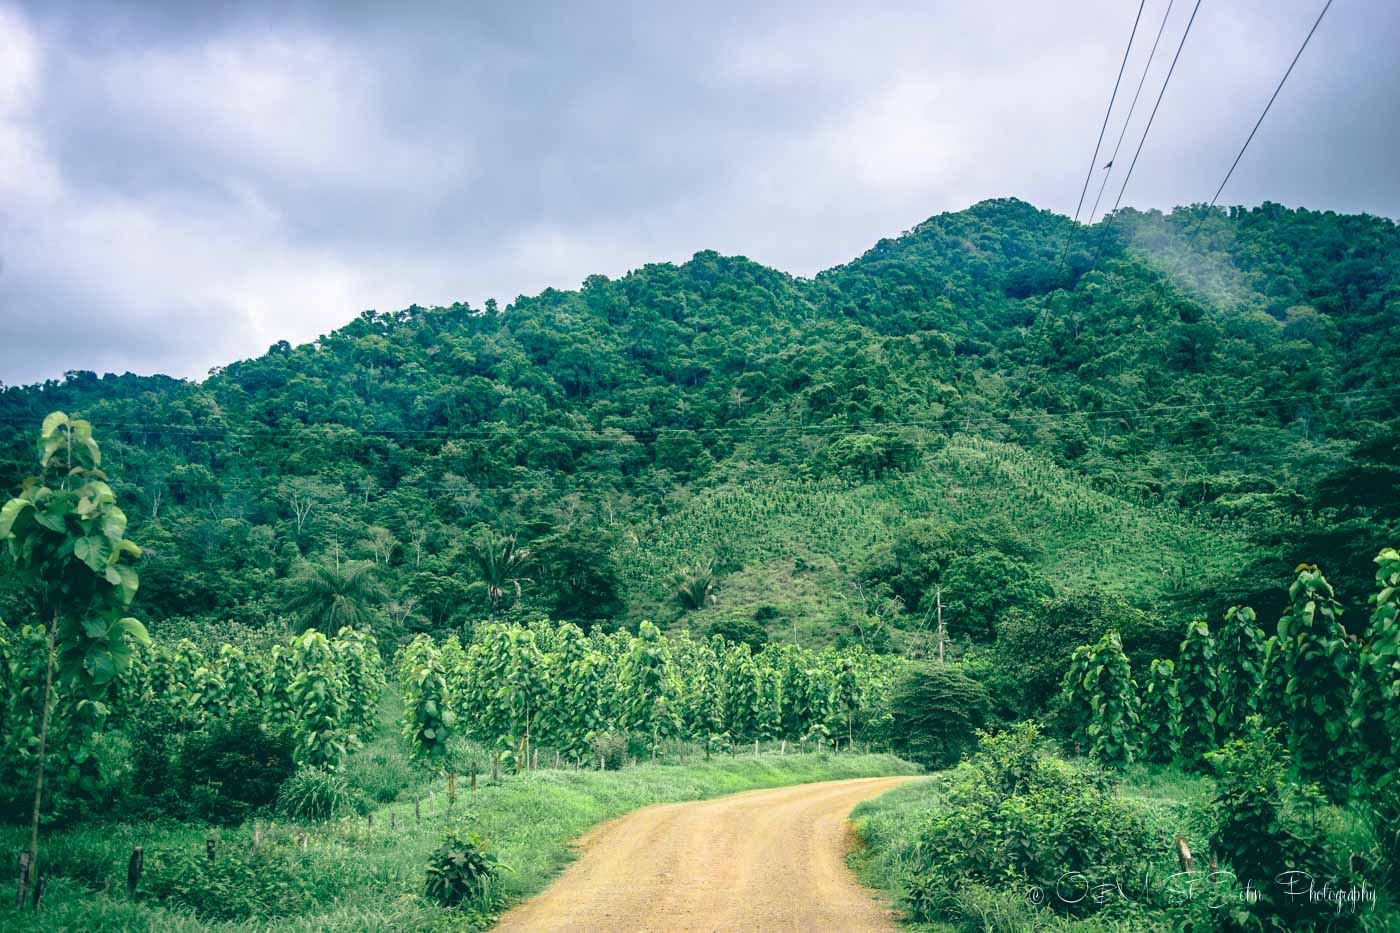 Road to Mal Pais, Nicoya Peninsula. Costa Rica